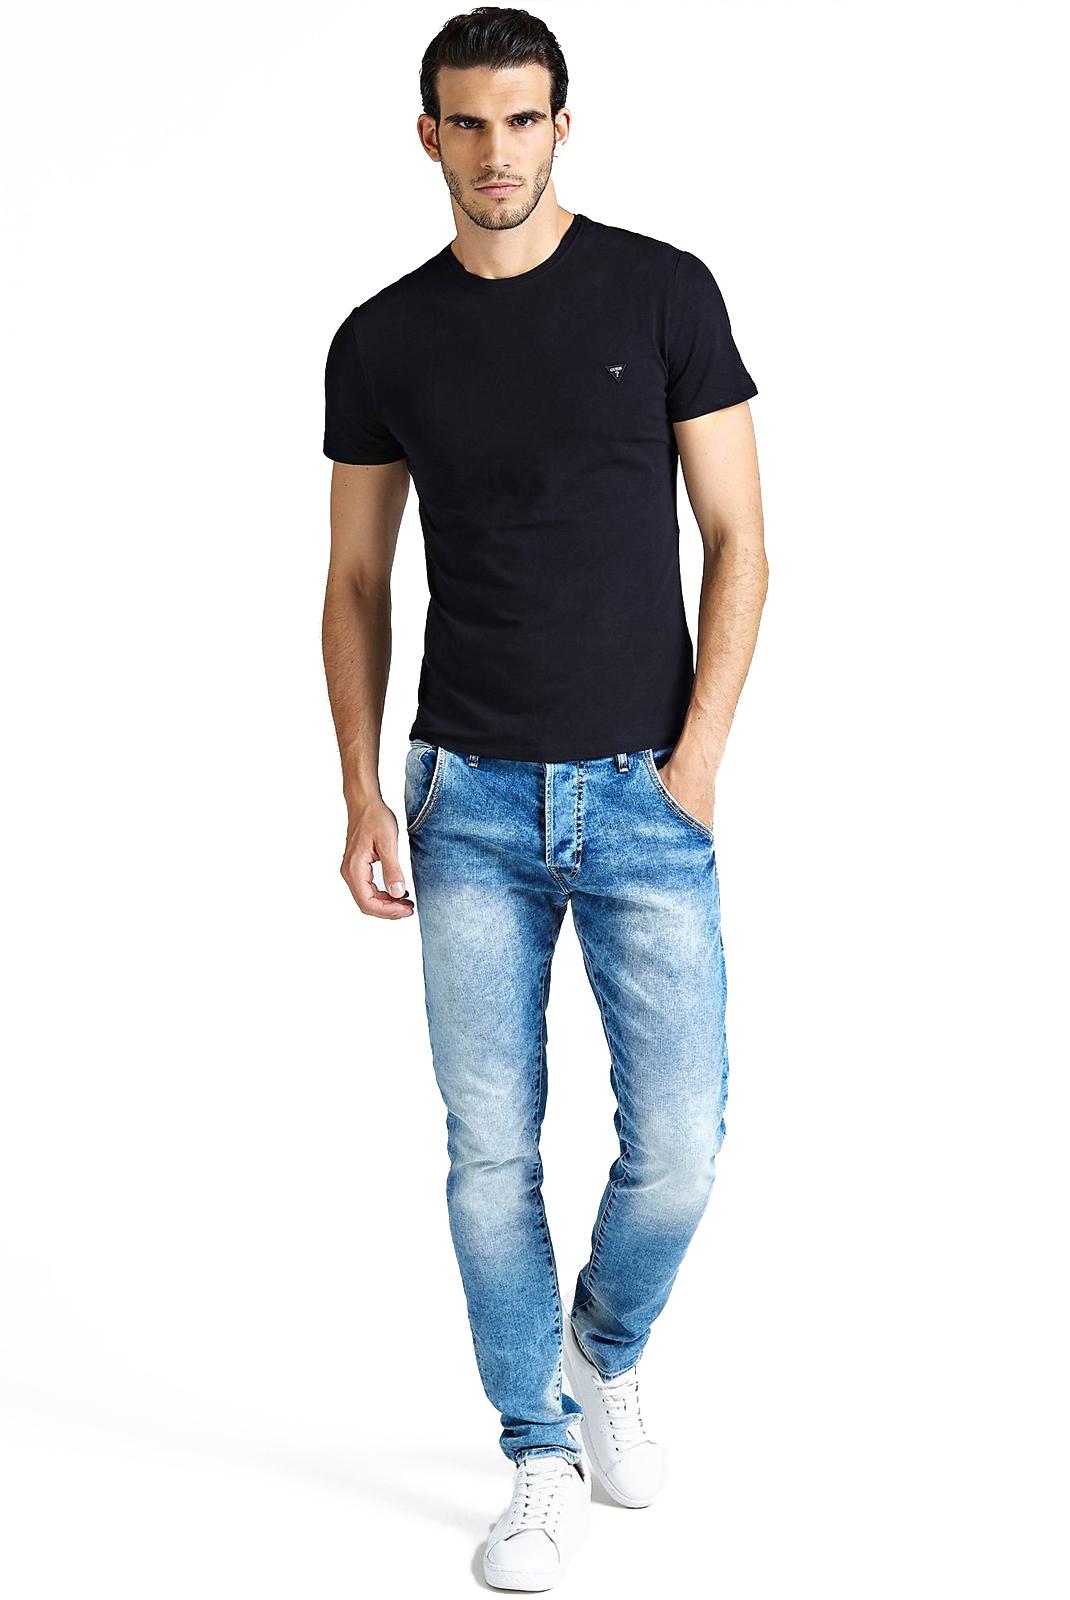 T-S manches courtes  Guess jeans M83I32 J1300 JBLK